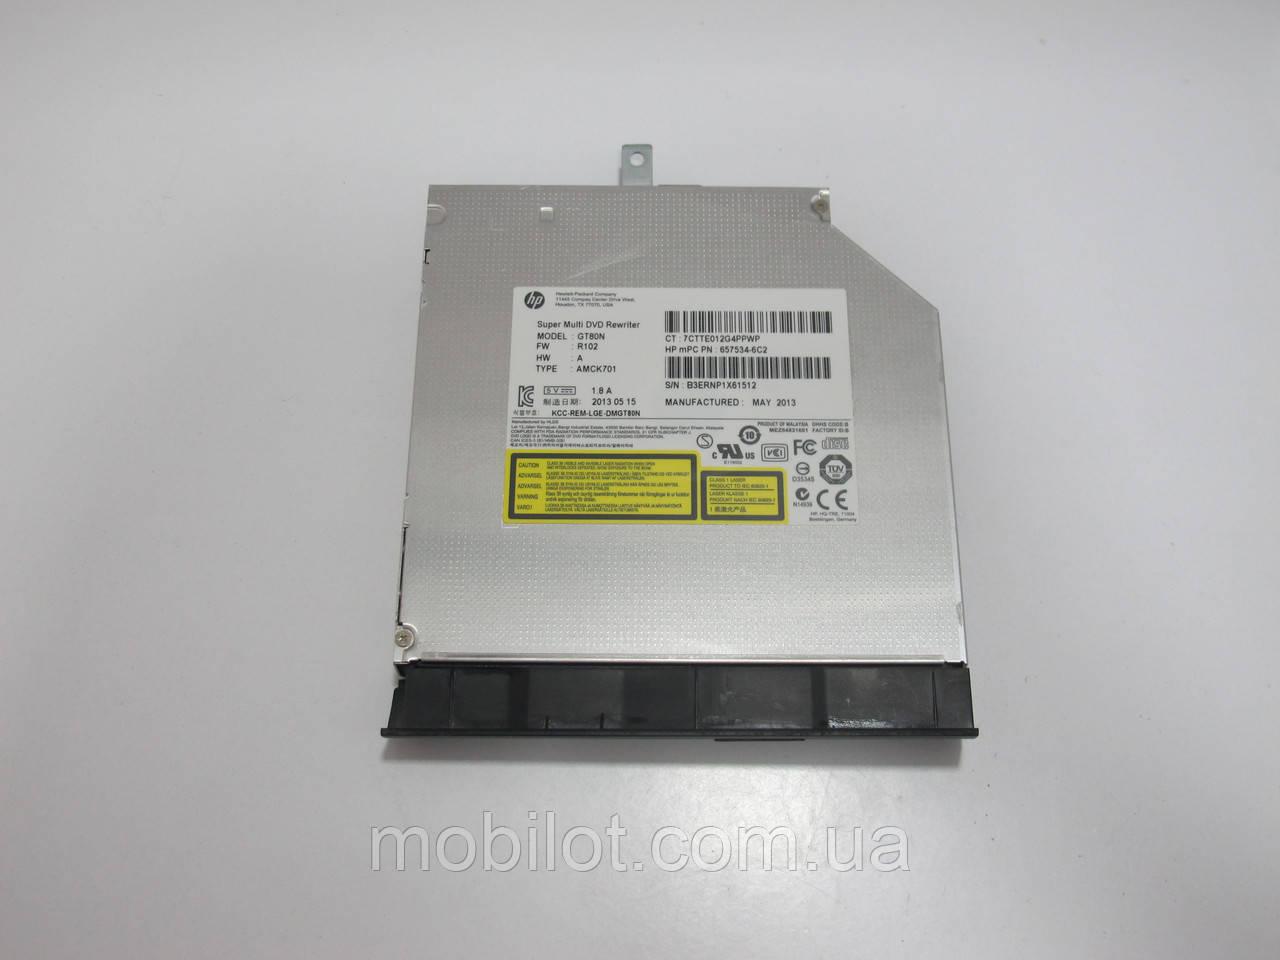 Оптический привод HP 250 G1 (NZ-3811)